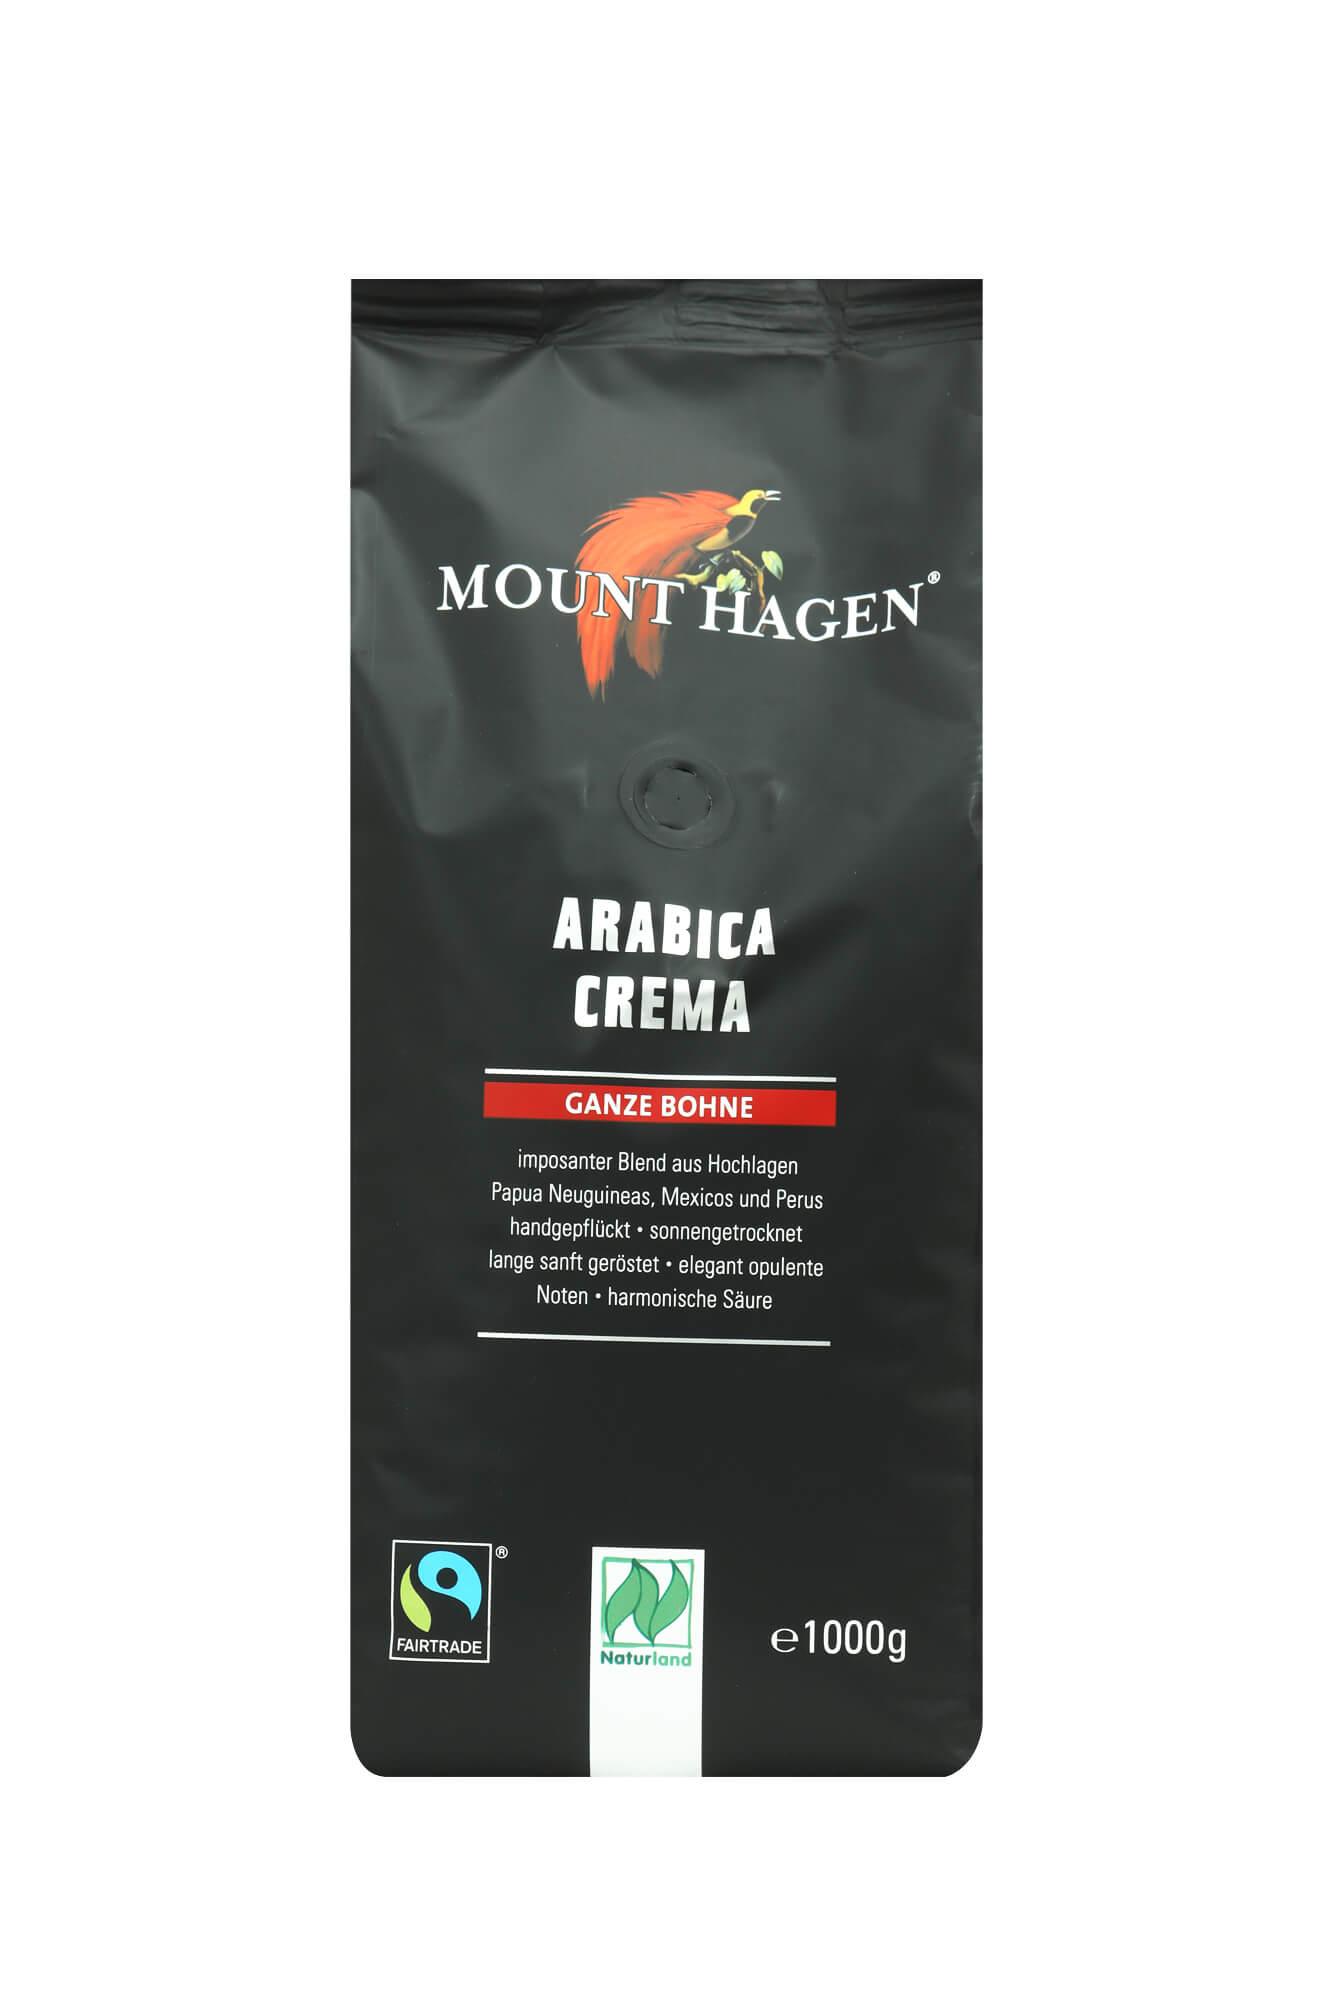 Hagen Mount Hagen Arabica Crema 1kg